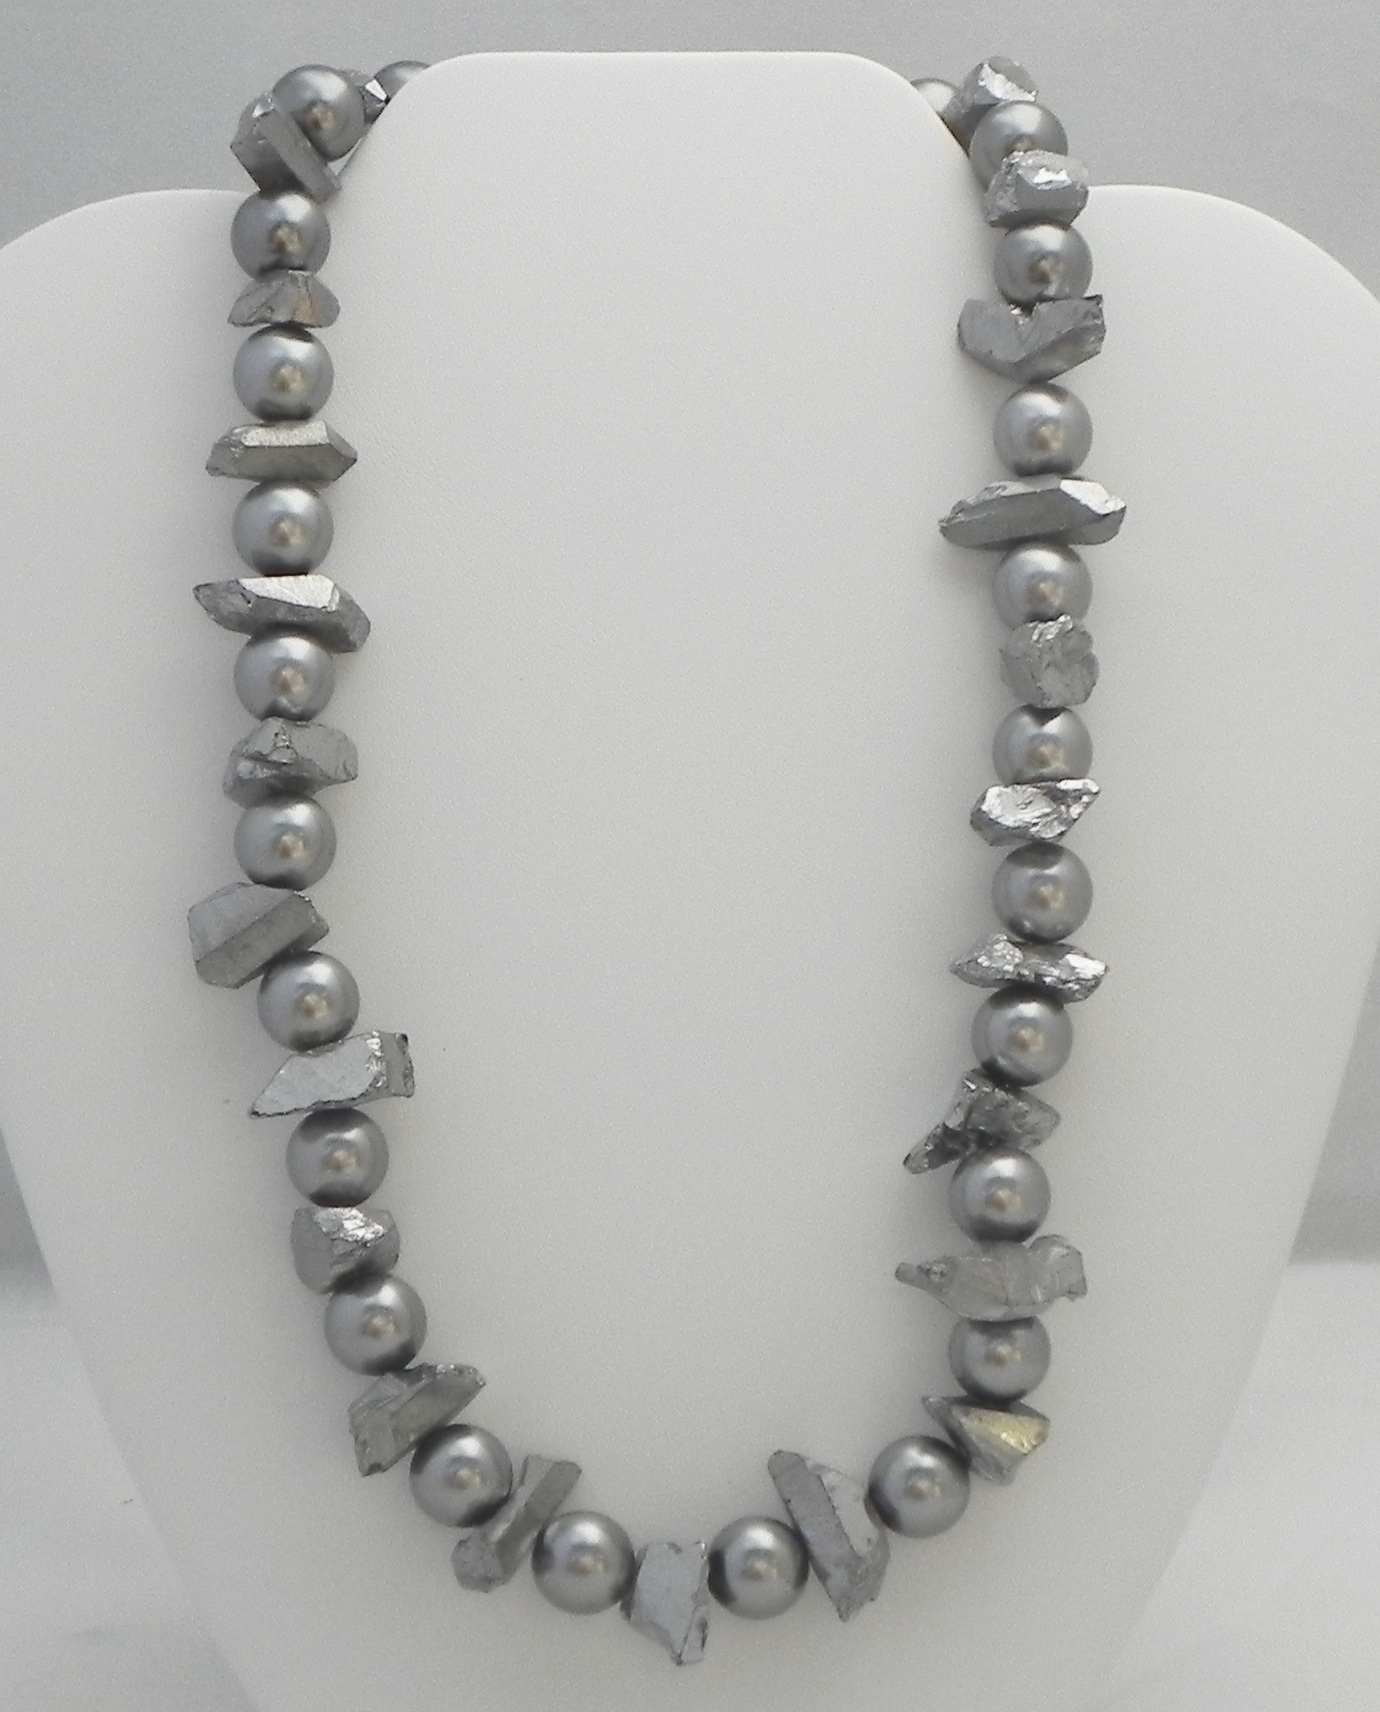 Swarovski Pearls & Quartz #827